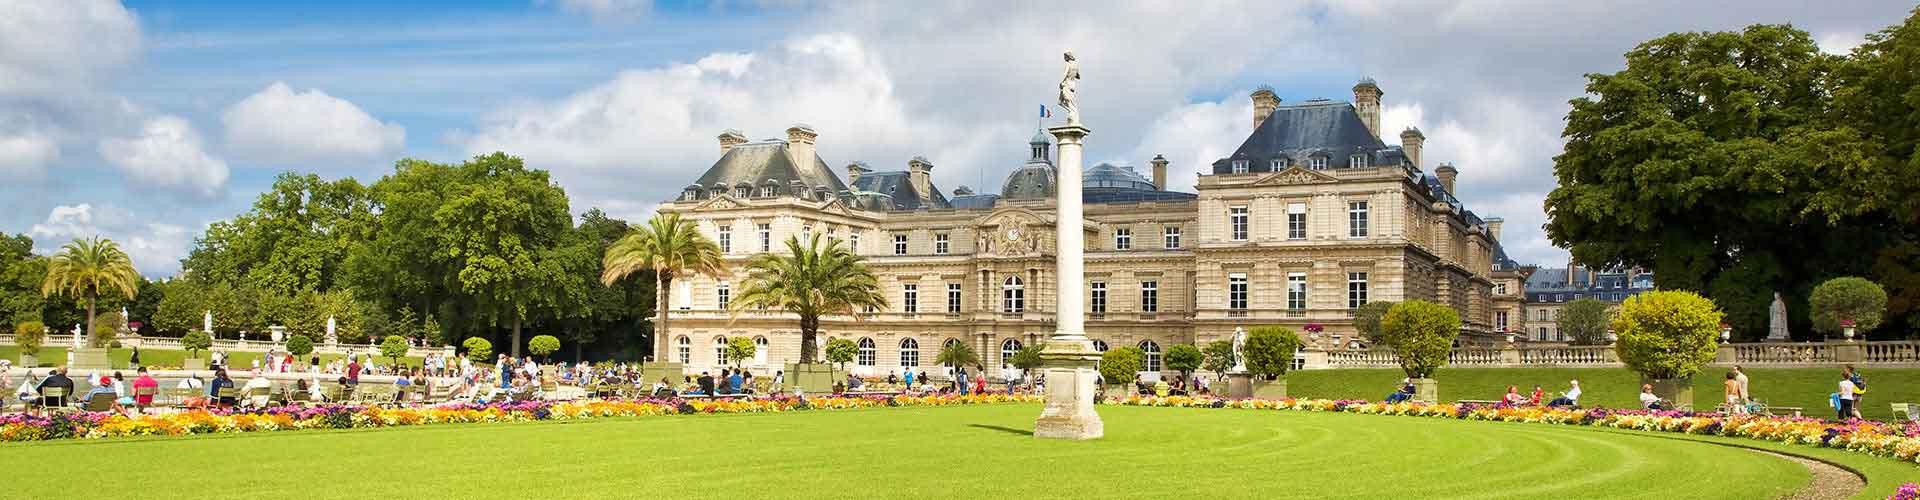 París - Albergues Juveniles cerca a Jardin de Luxembourg. Mapas de París, Fotos y Comentarios para cada Albergue Juvenil en París.